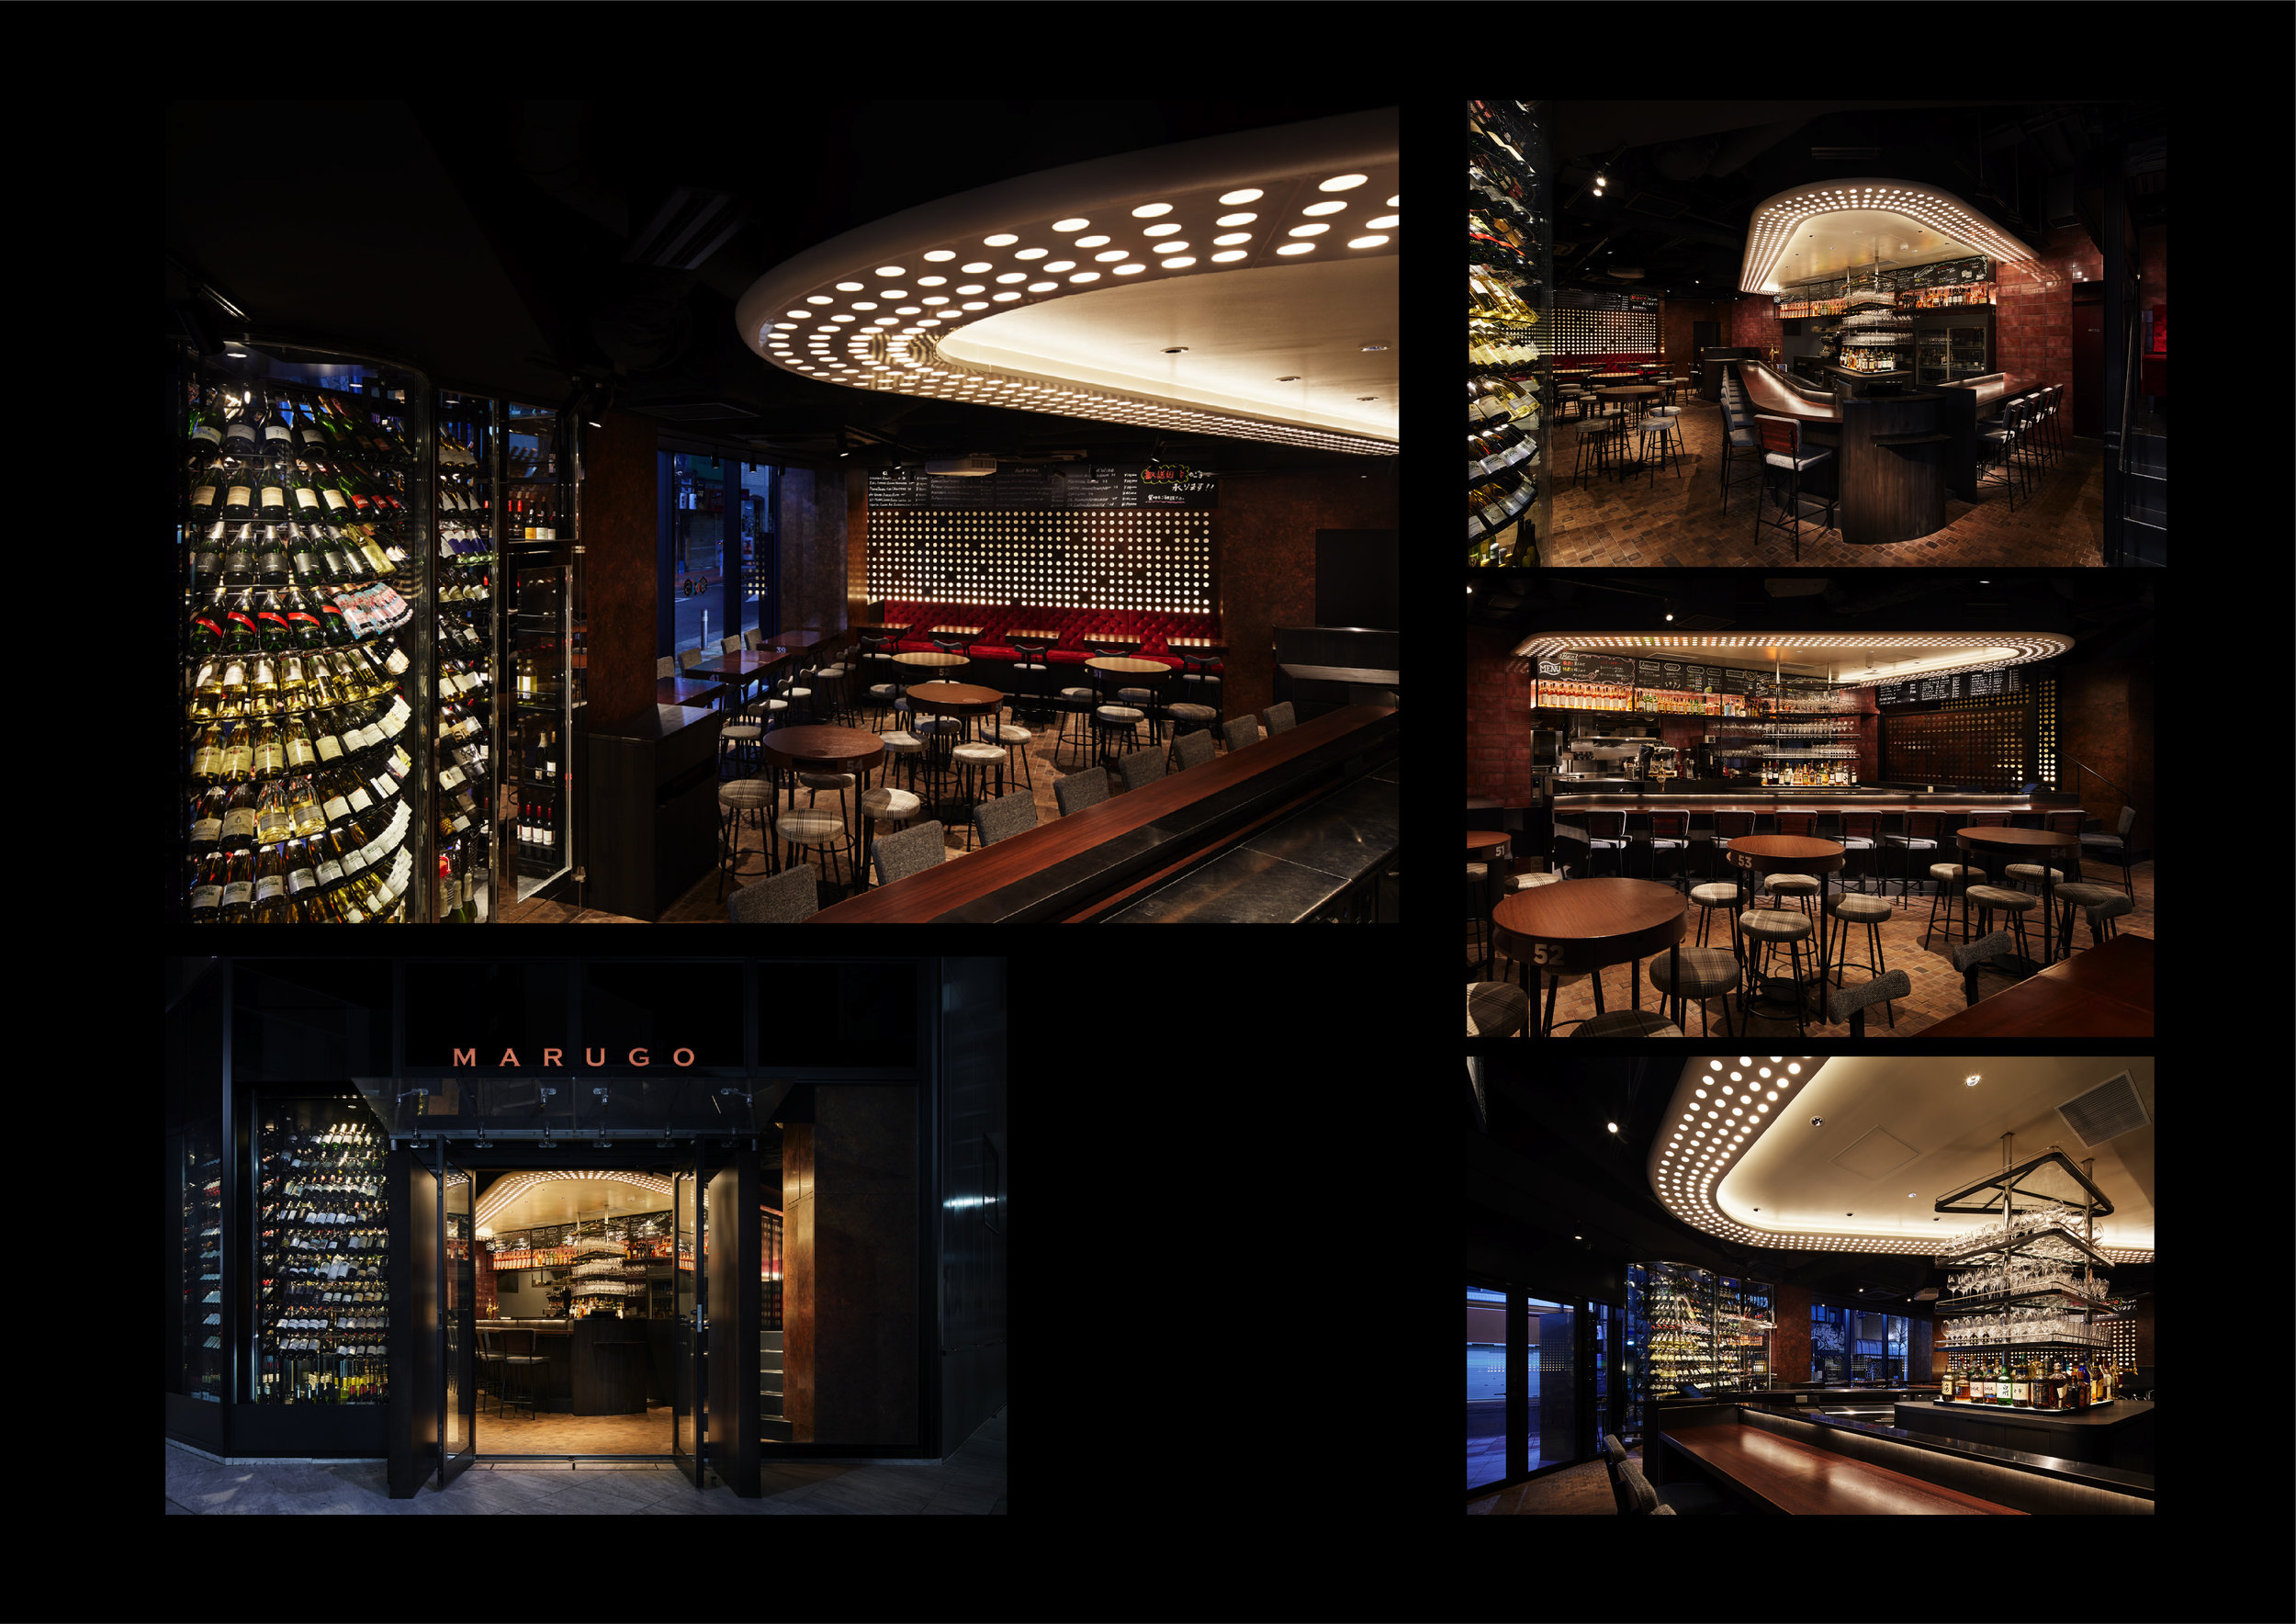 MARUGO SHINBASHI - Design by: MASTERD Co., LtdInterior Division: Retail DesignWebsite: http://masterd.co.jp/